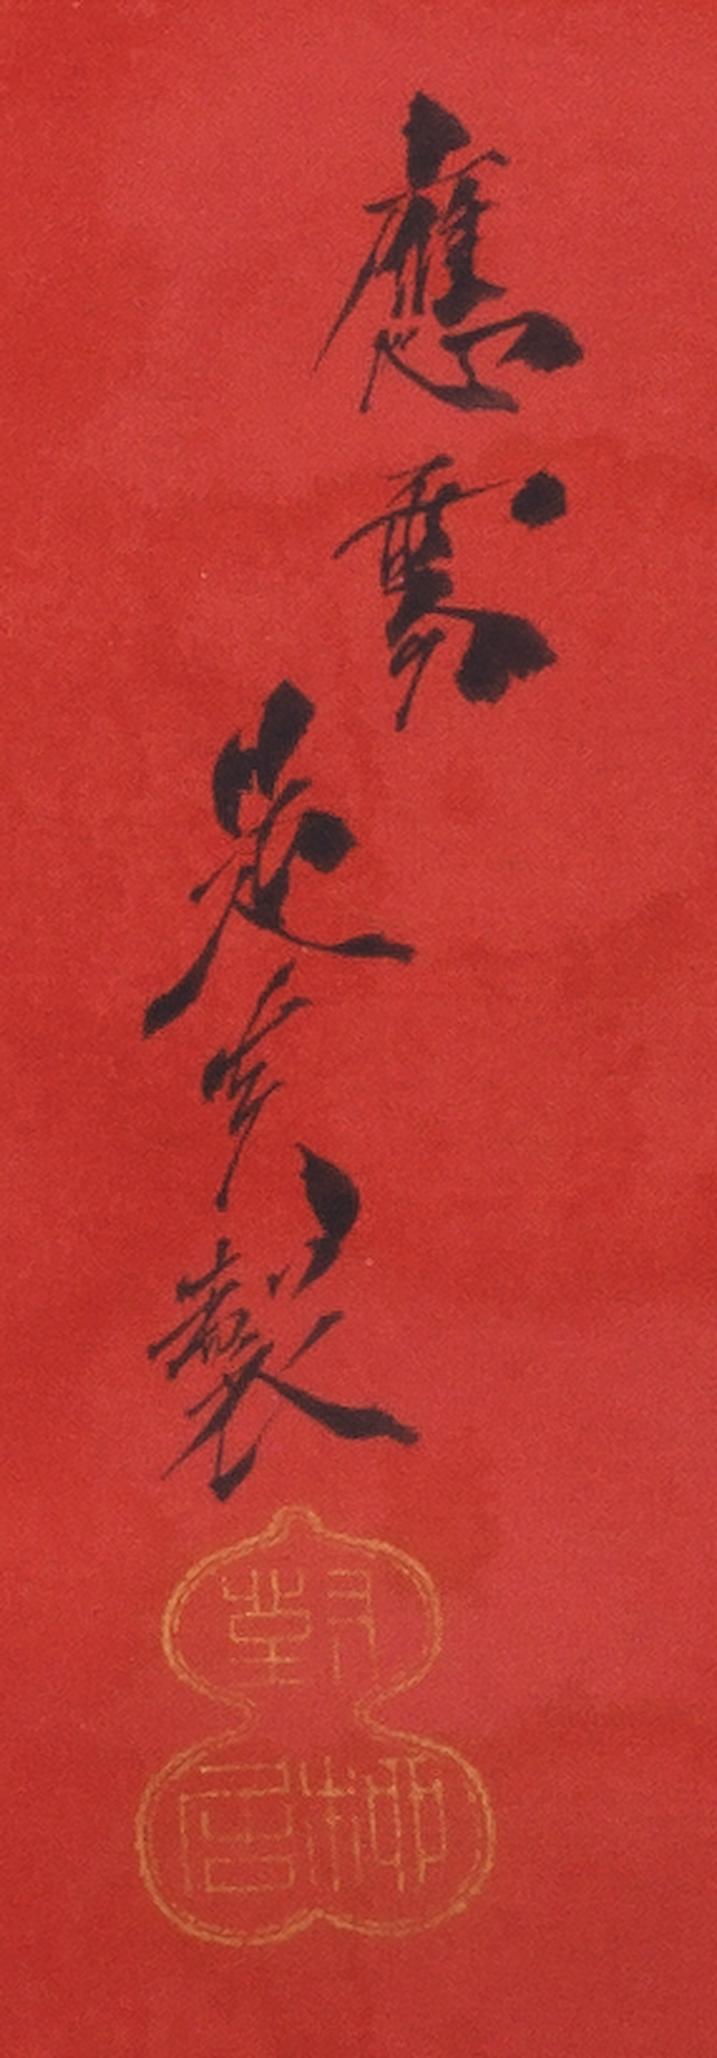 SHIBATA ZESHIN 柴田是真 (1807–1891) EMBLEMS OF THE FIVE GREAT FESTIVALS, WITH PAINTED MOUNTS 描表具五節句図絹本着色掛軸五幅対 Meiji era (1868–1912), circa 1880–1890